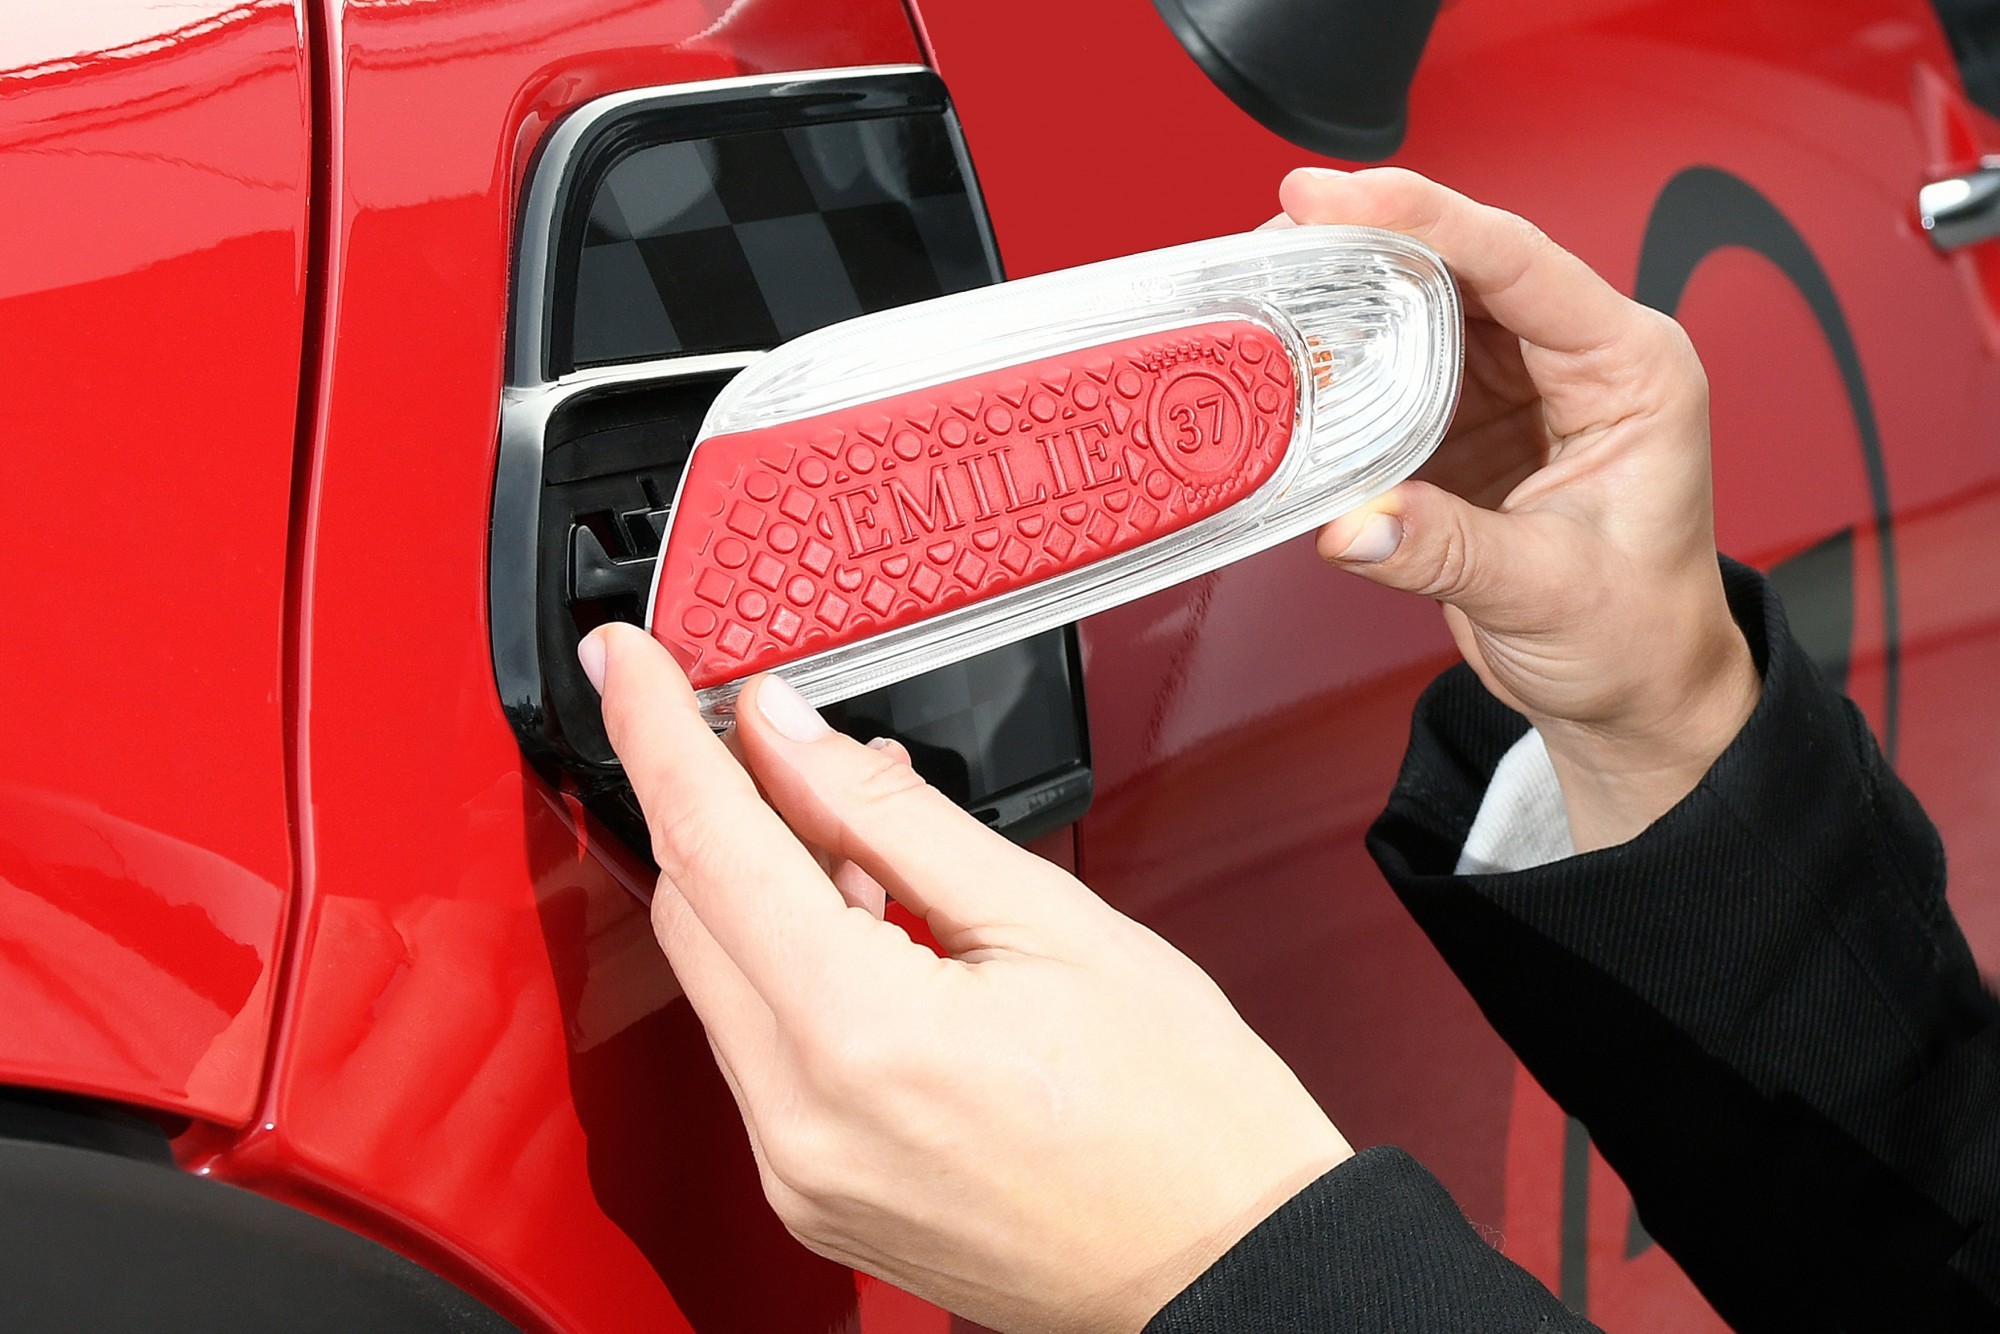 MINI Drivers Can Print Custom Parts - Digital Engineering 24/7